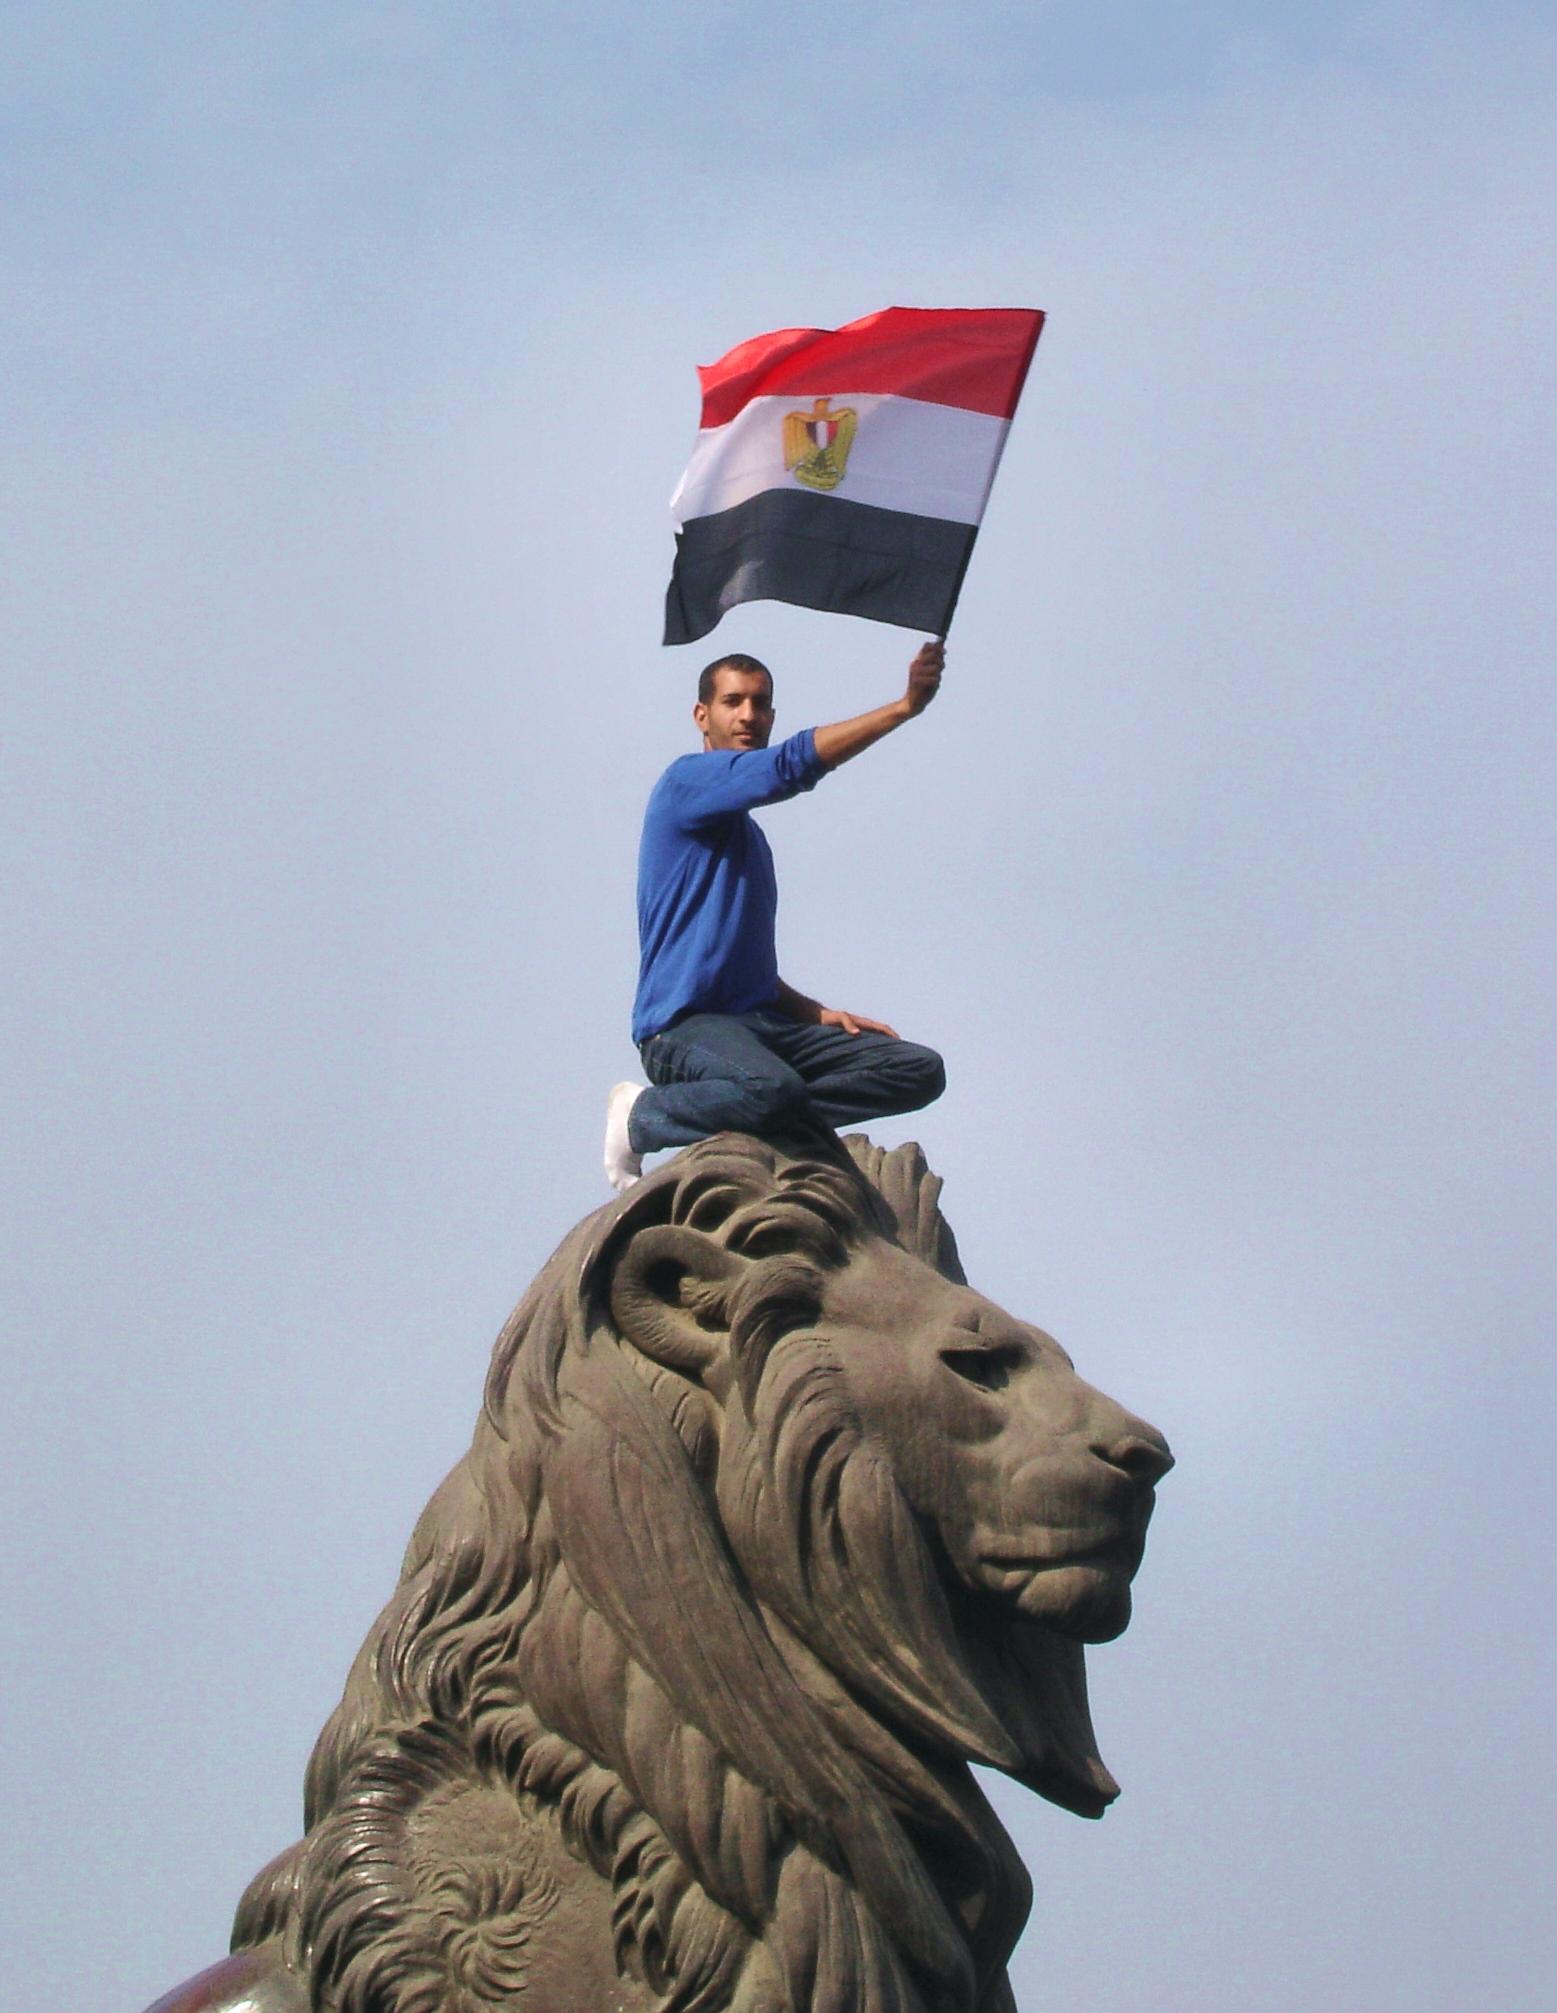 the_lion_of_egyptian_revolution_qasr_al-nil_bridge-edit2